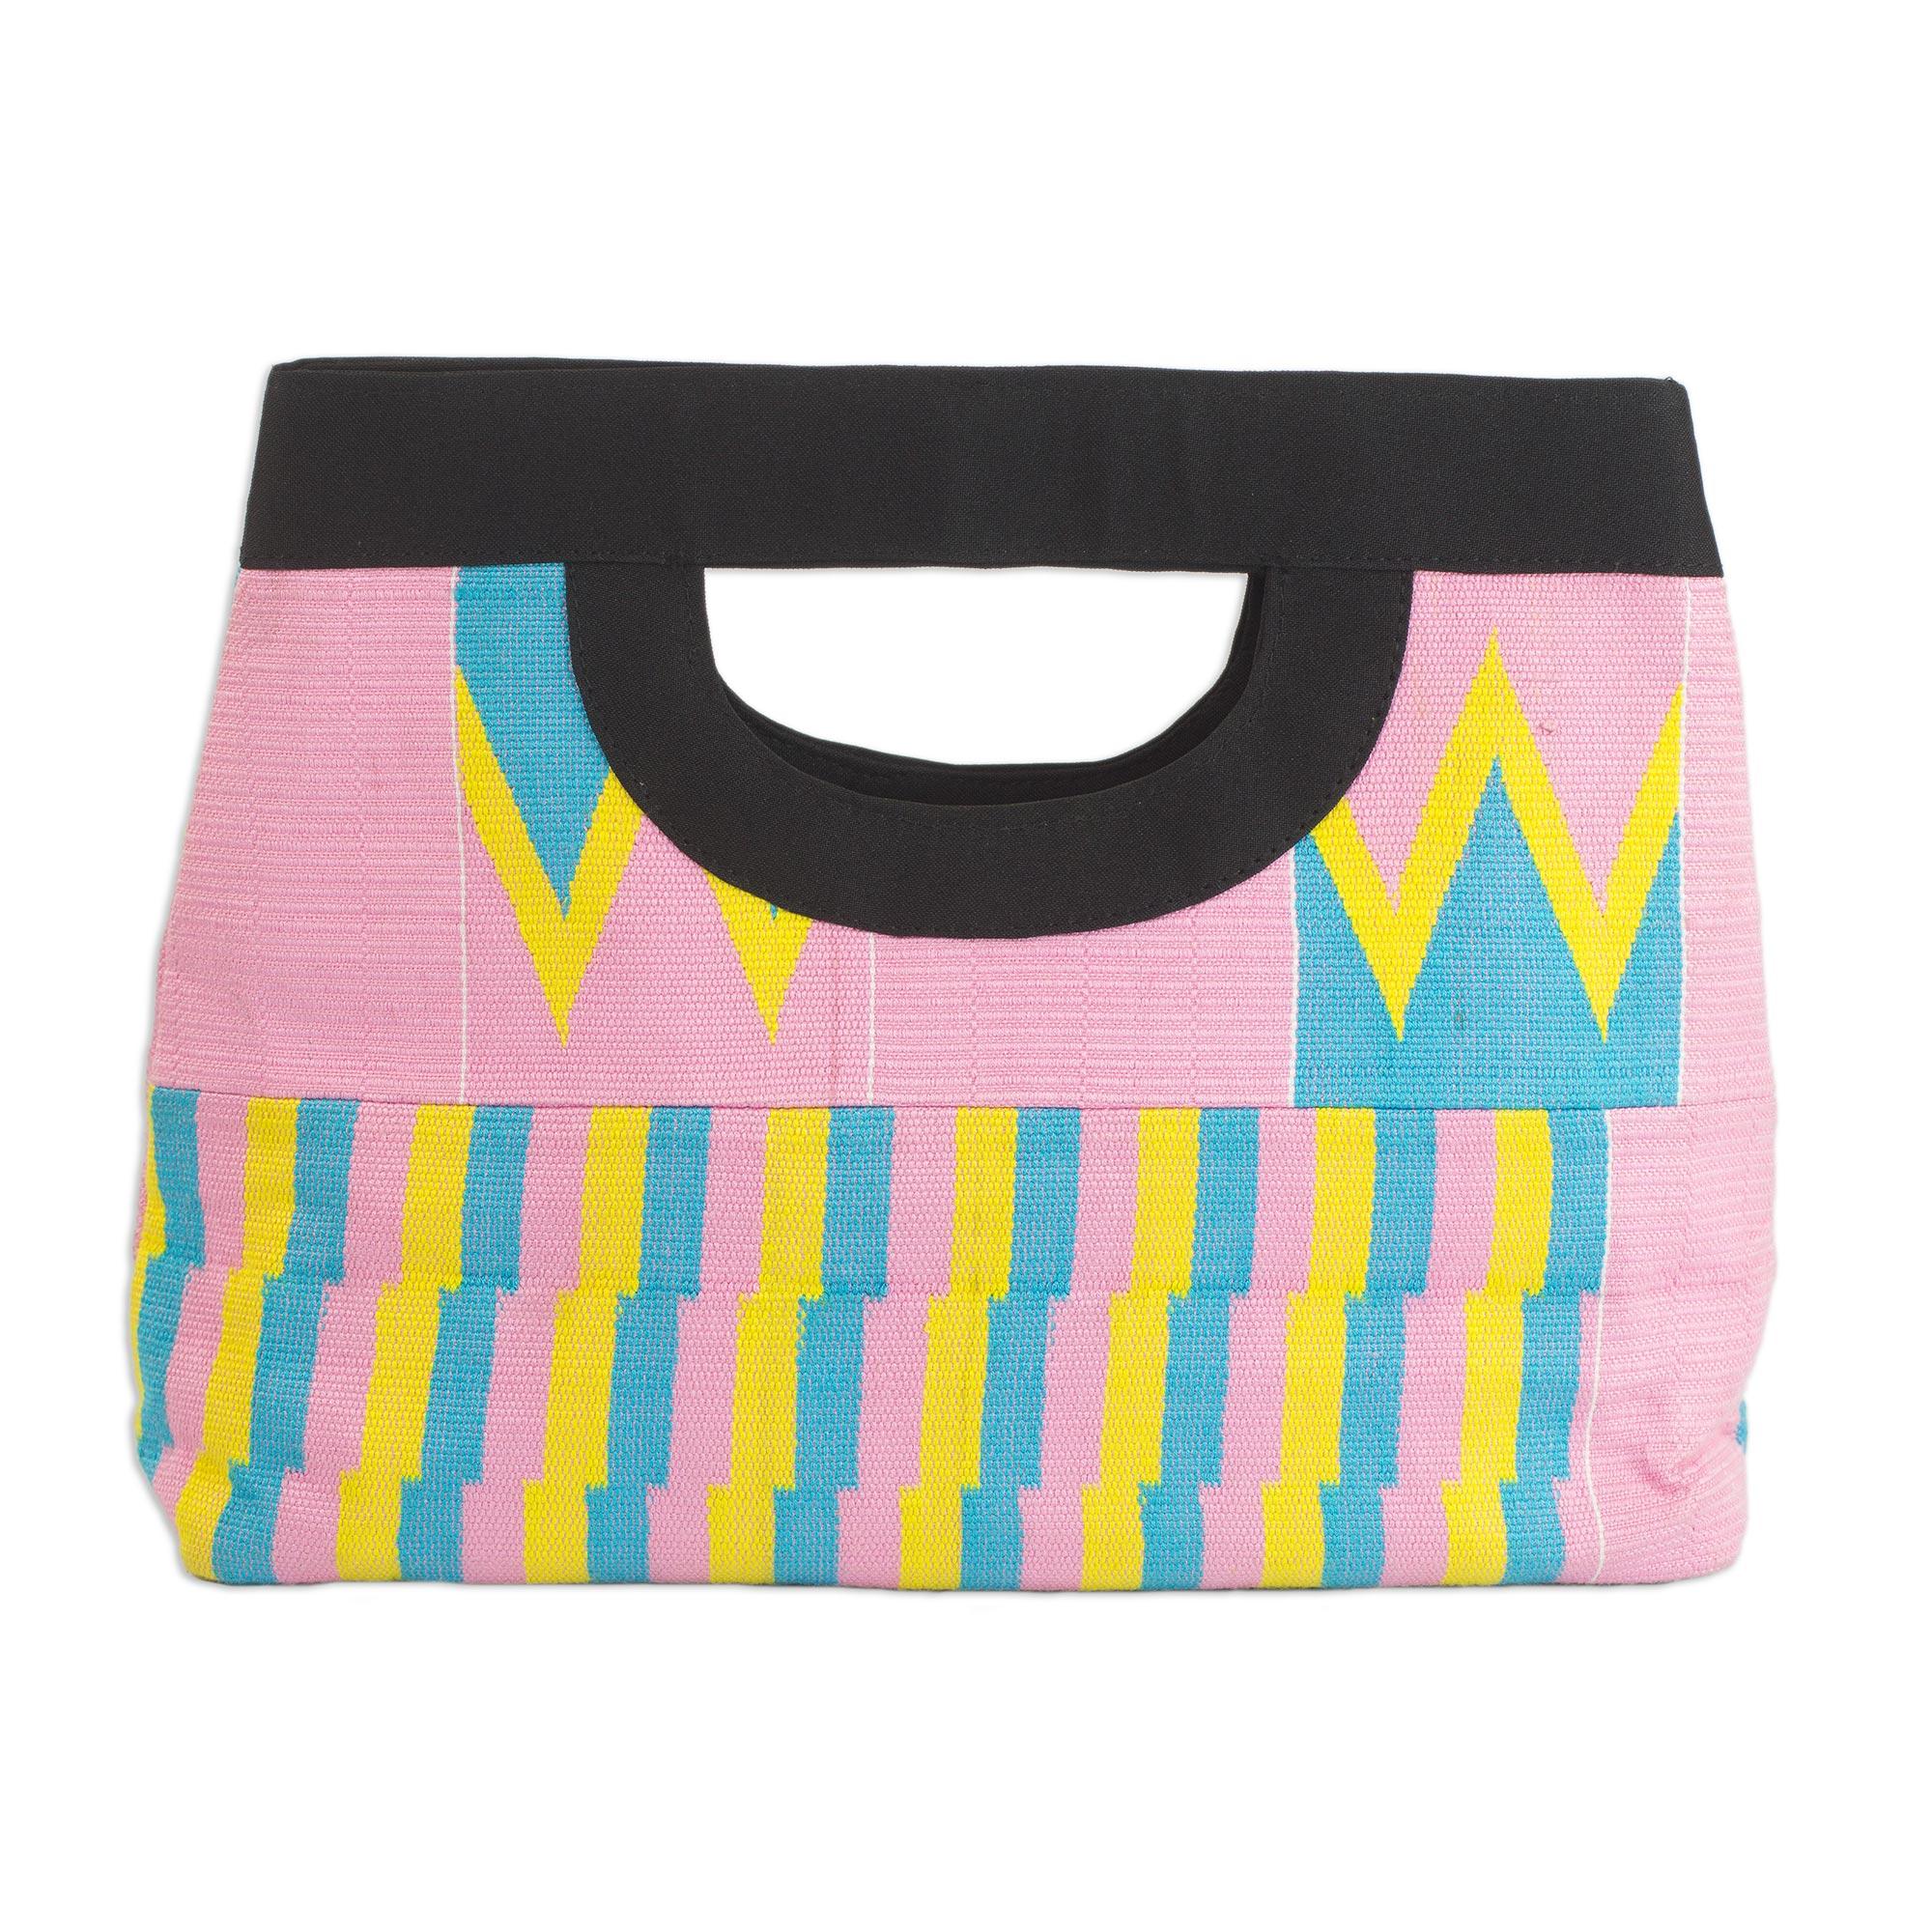 Novica Cotton kente tote handbag, Pink Is Sweet